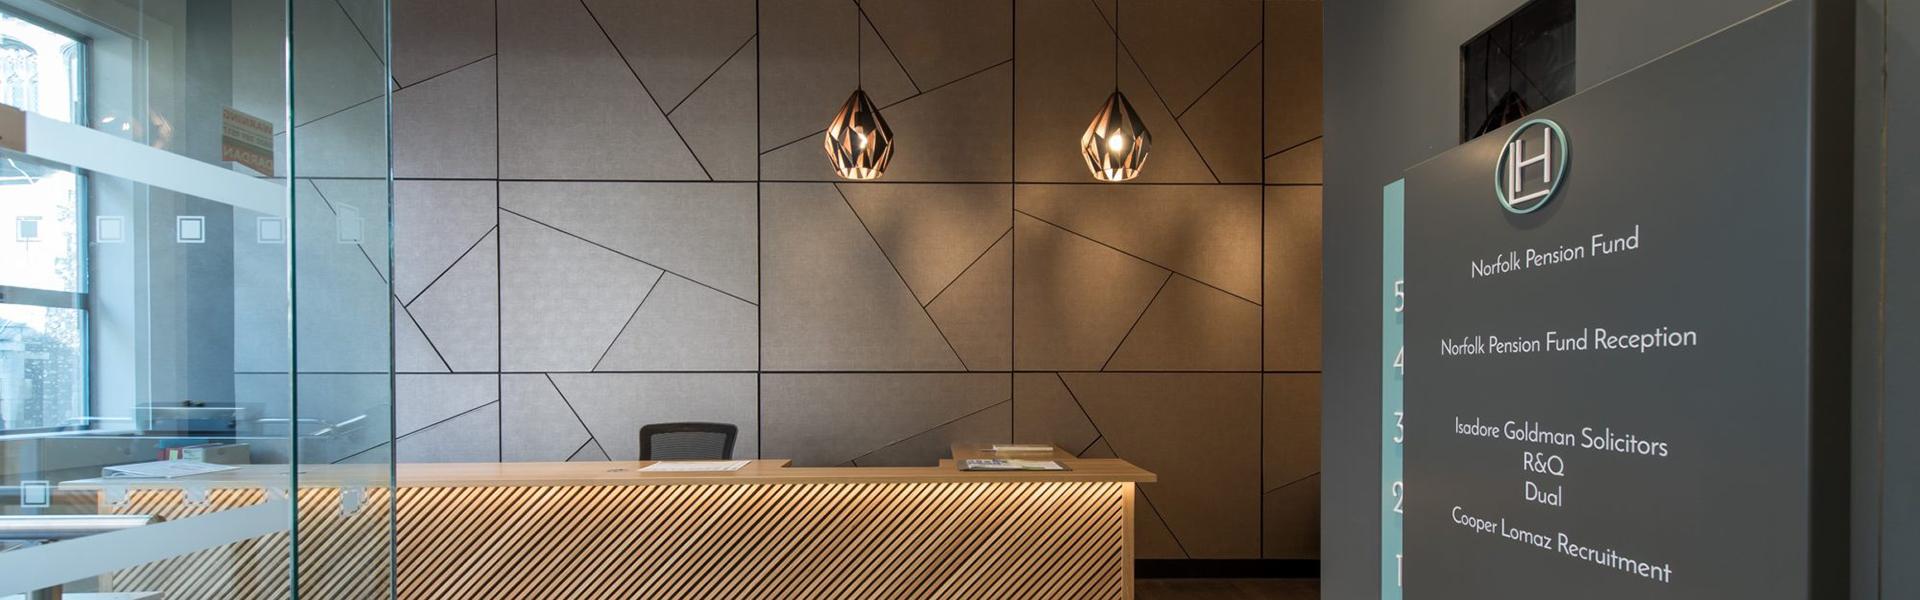 Commercial Interior Design Norfolk